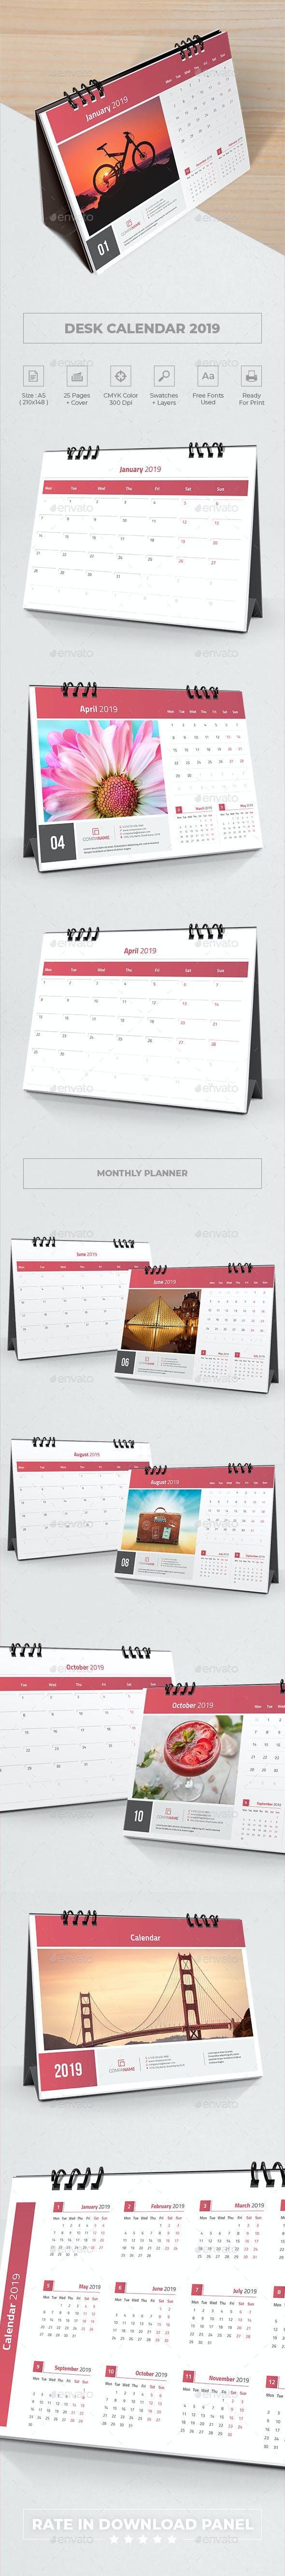 Desk Calendar 2019 Planner By Bourjart Graphicriver